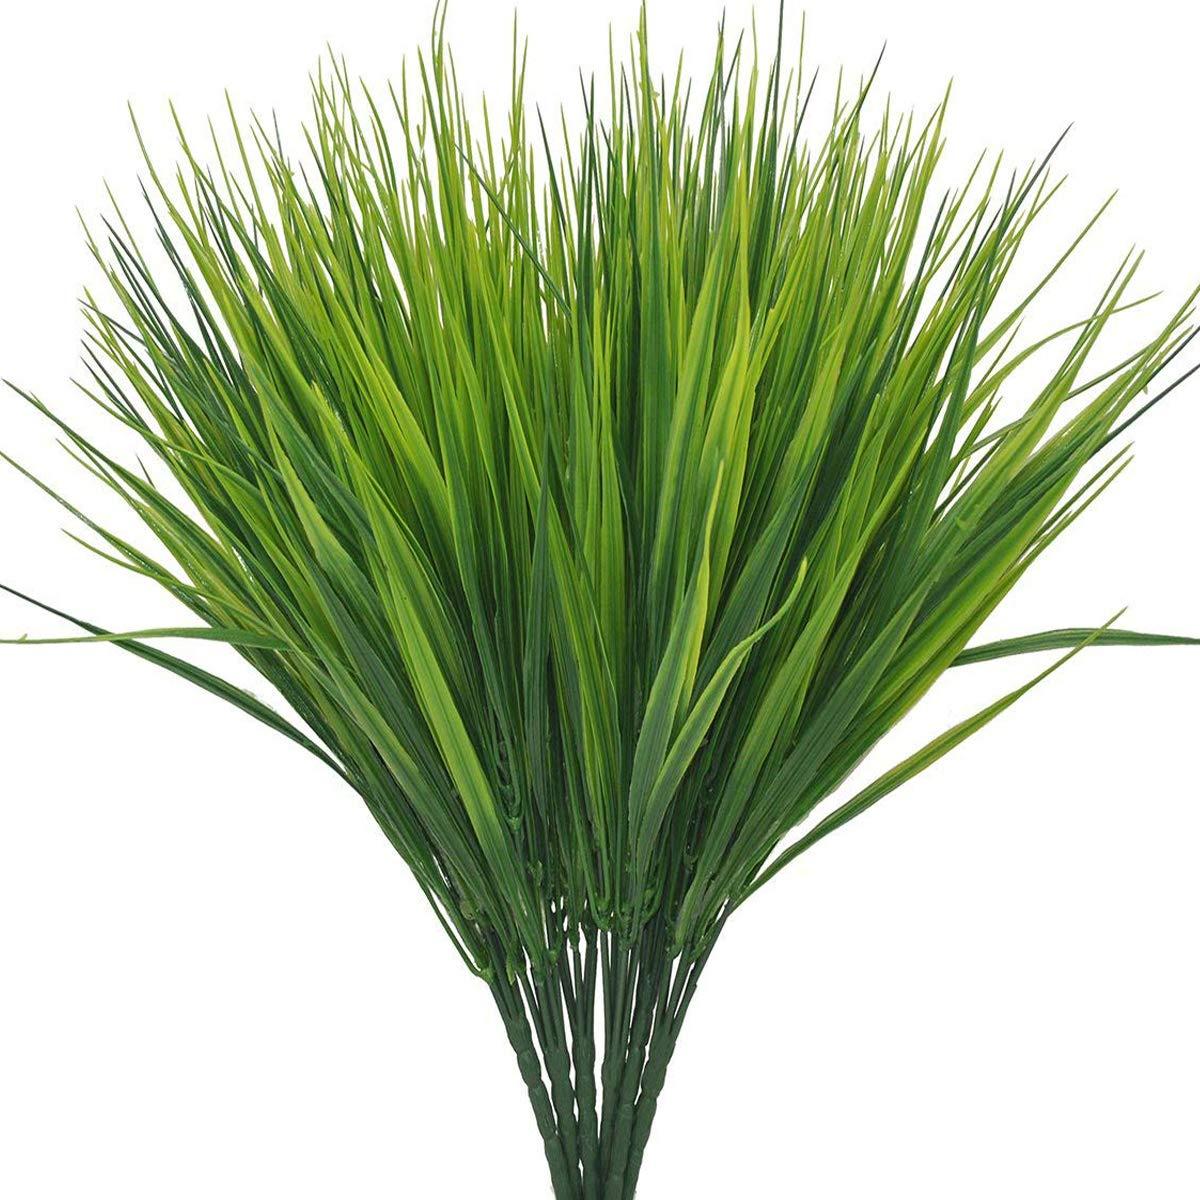 6 PCS Artificial Plants Outdoor Greenery Faux Plastic Wheat Grass Bushes Indoor Outside Green Verandah Office Wedding Decor UV Resistant Plant